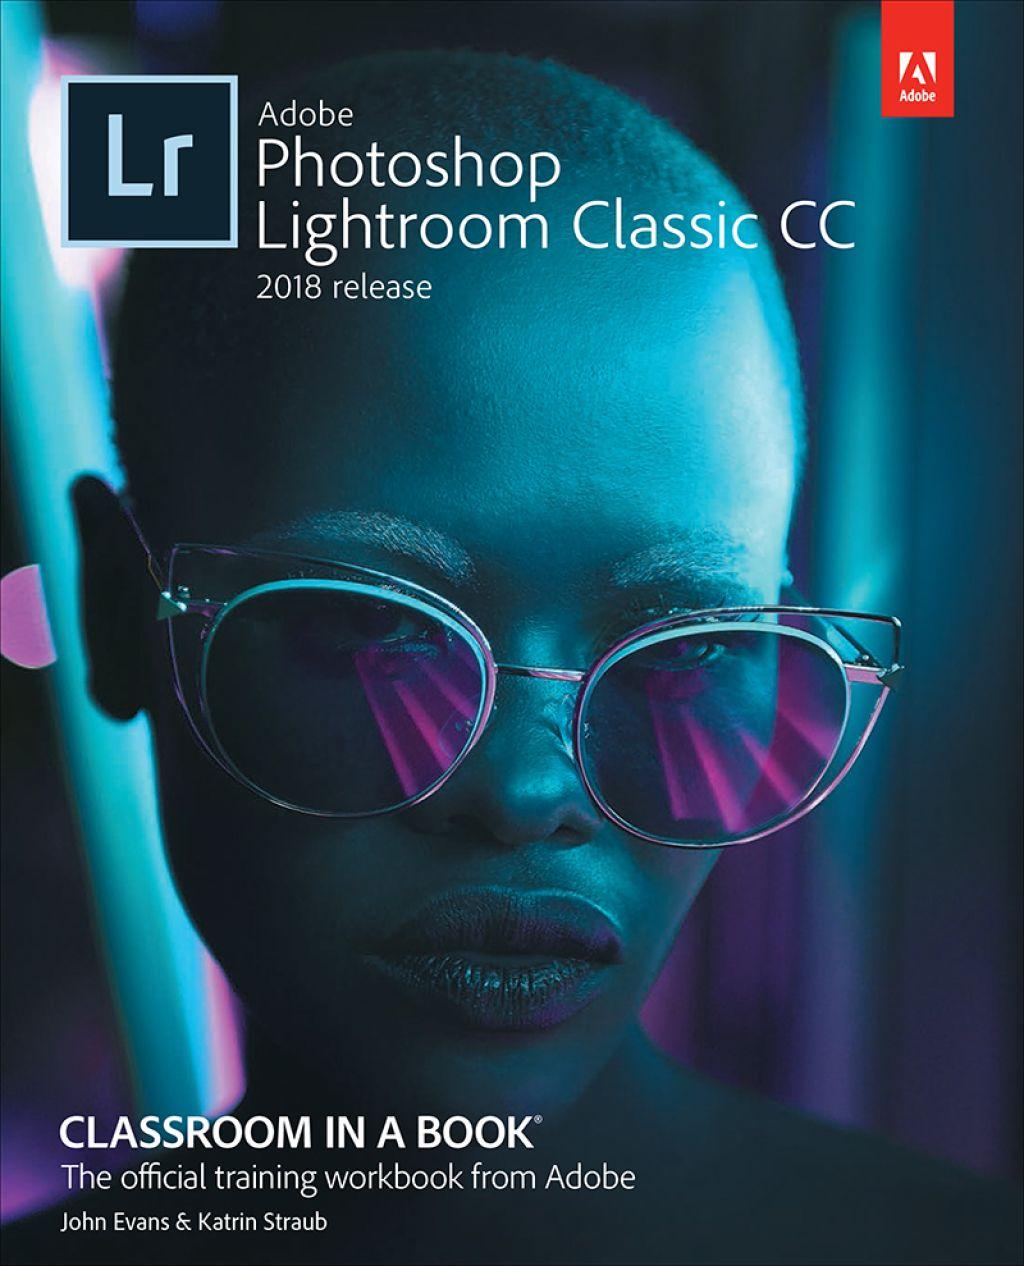 Adobe Photoshop Lightroom Classic Cc Classroom In A Book 2018